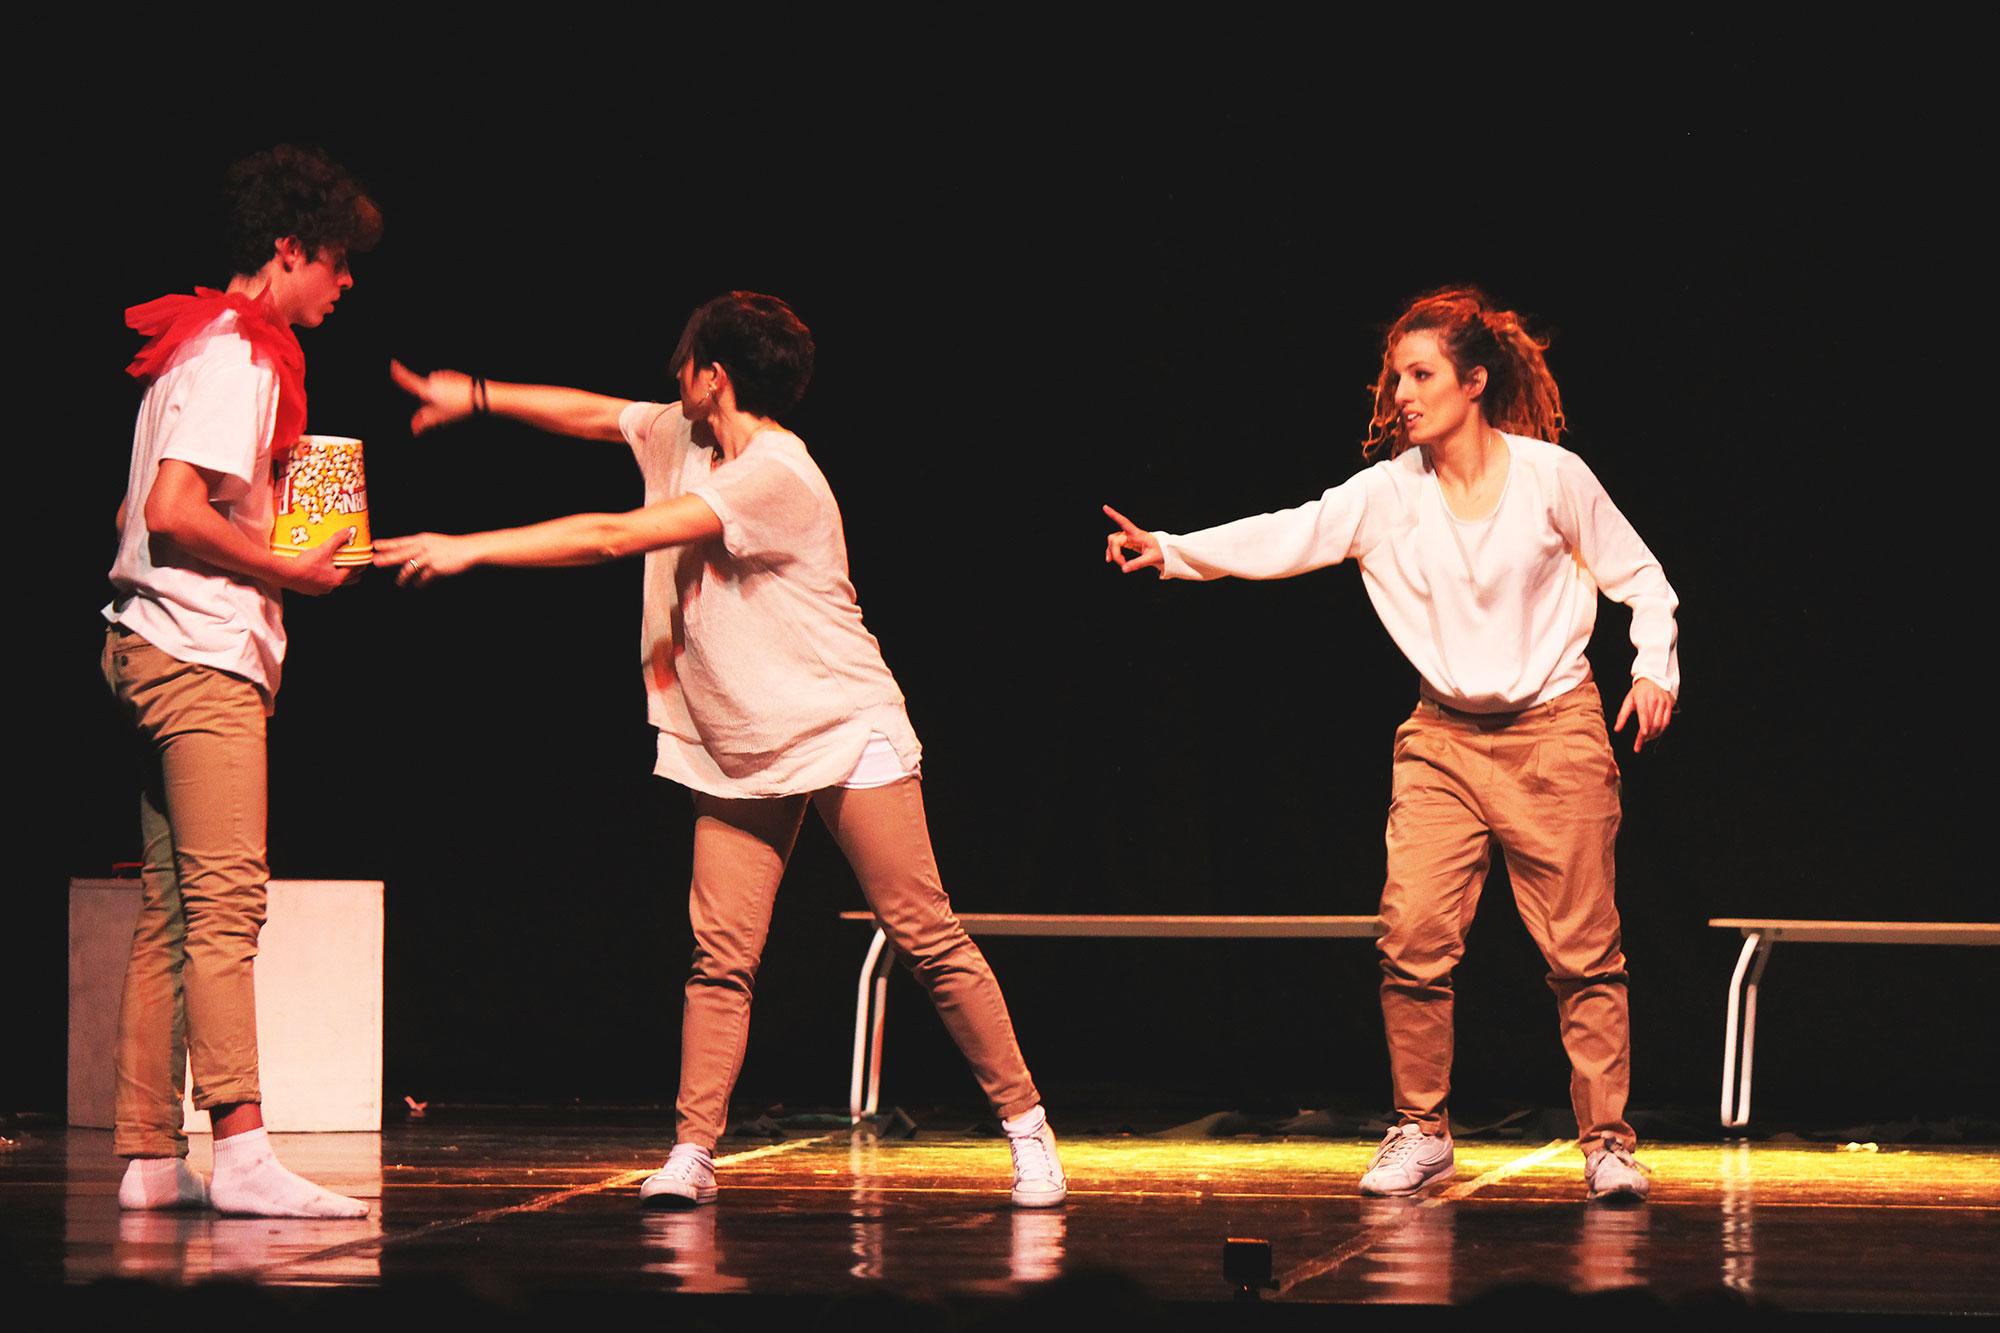 Round Trip | Teatro Binario 7 - Monza_22